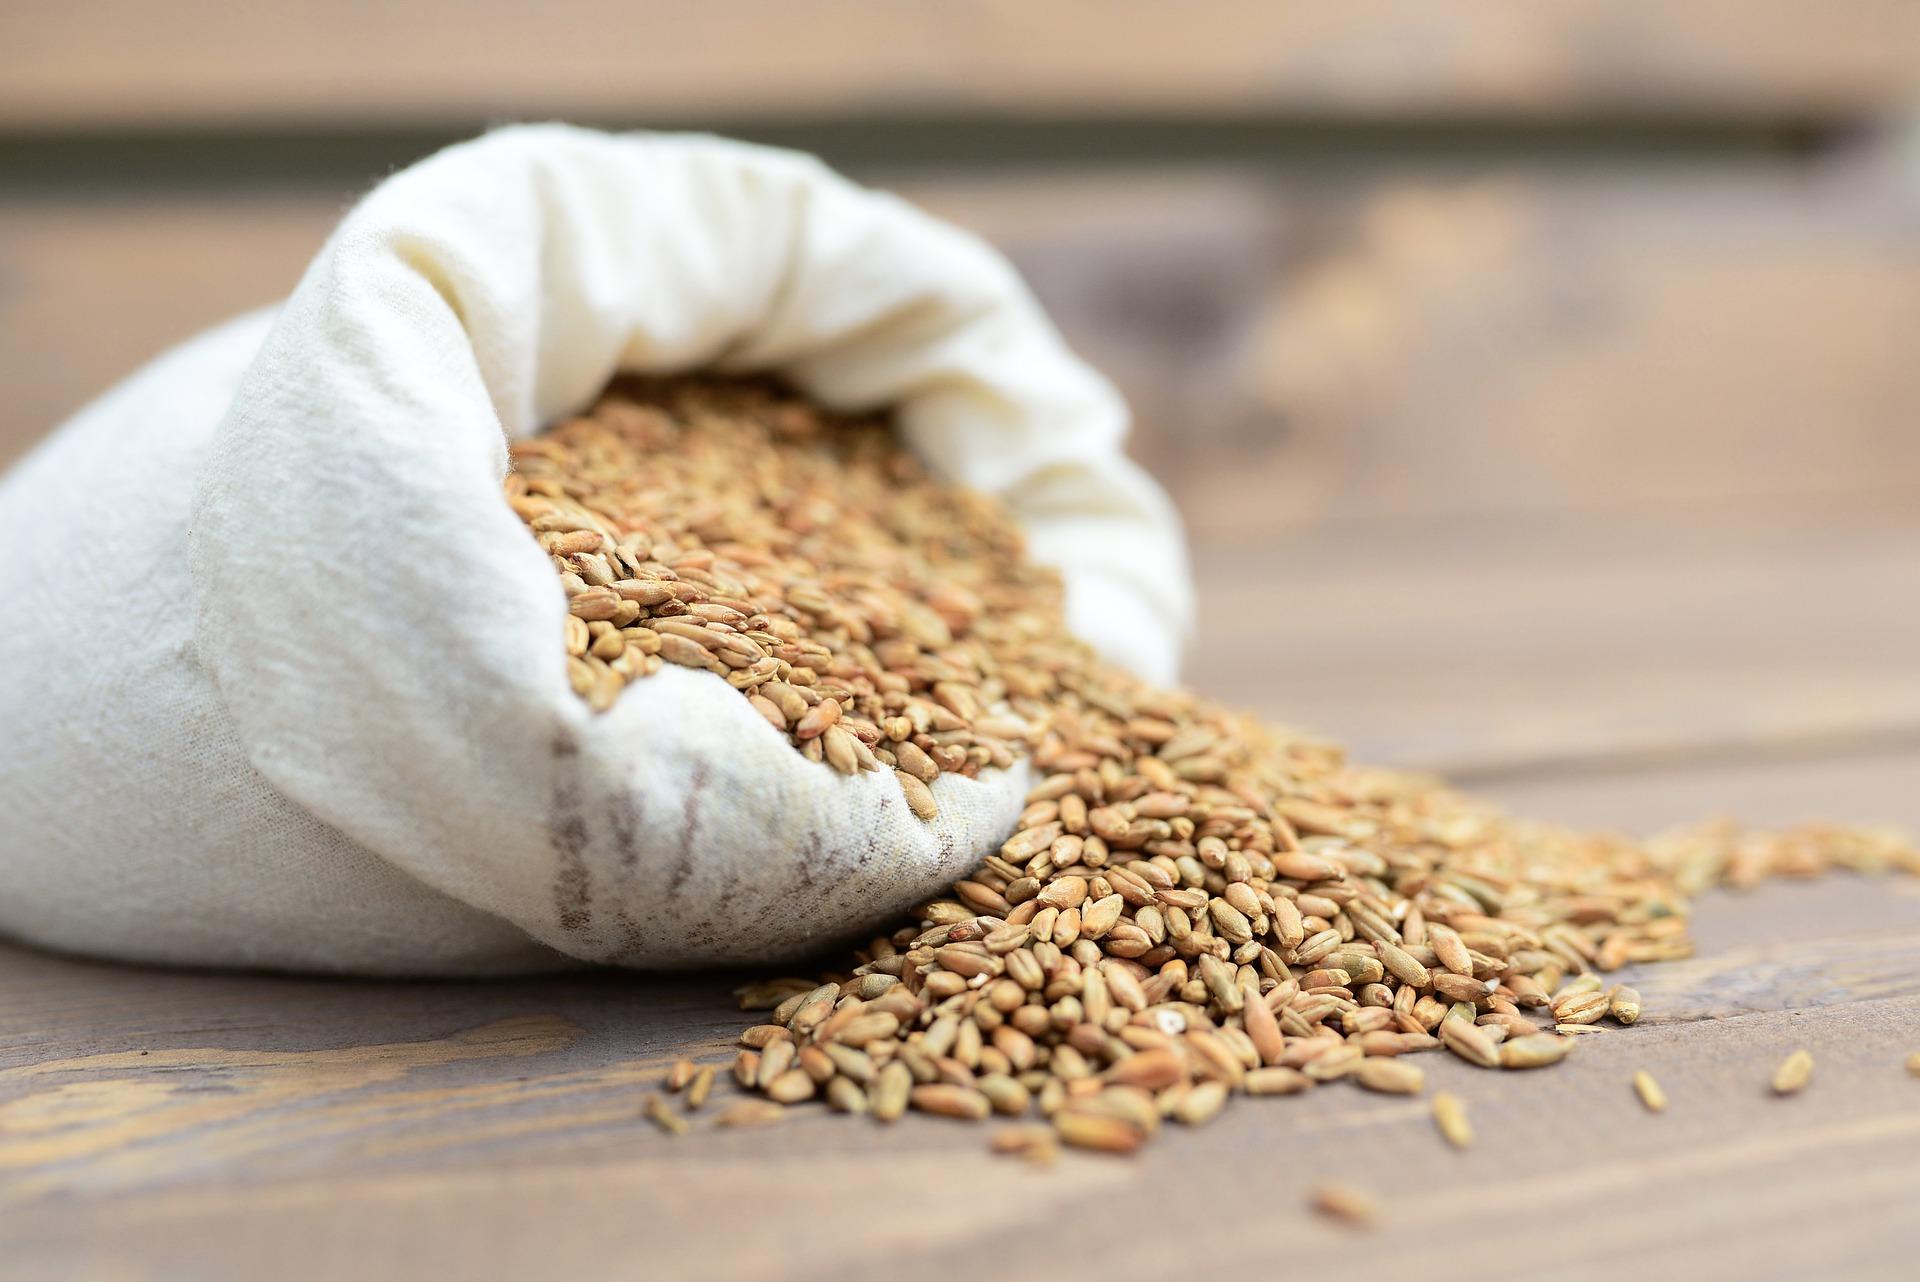 Зарабатываем на продаже зерна - 1 000 000 рублей в кармане!